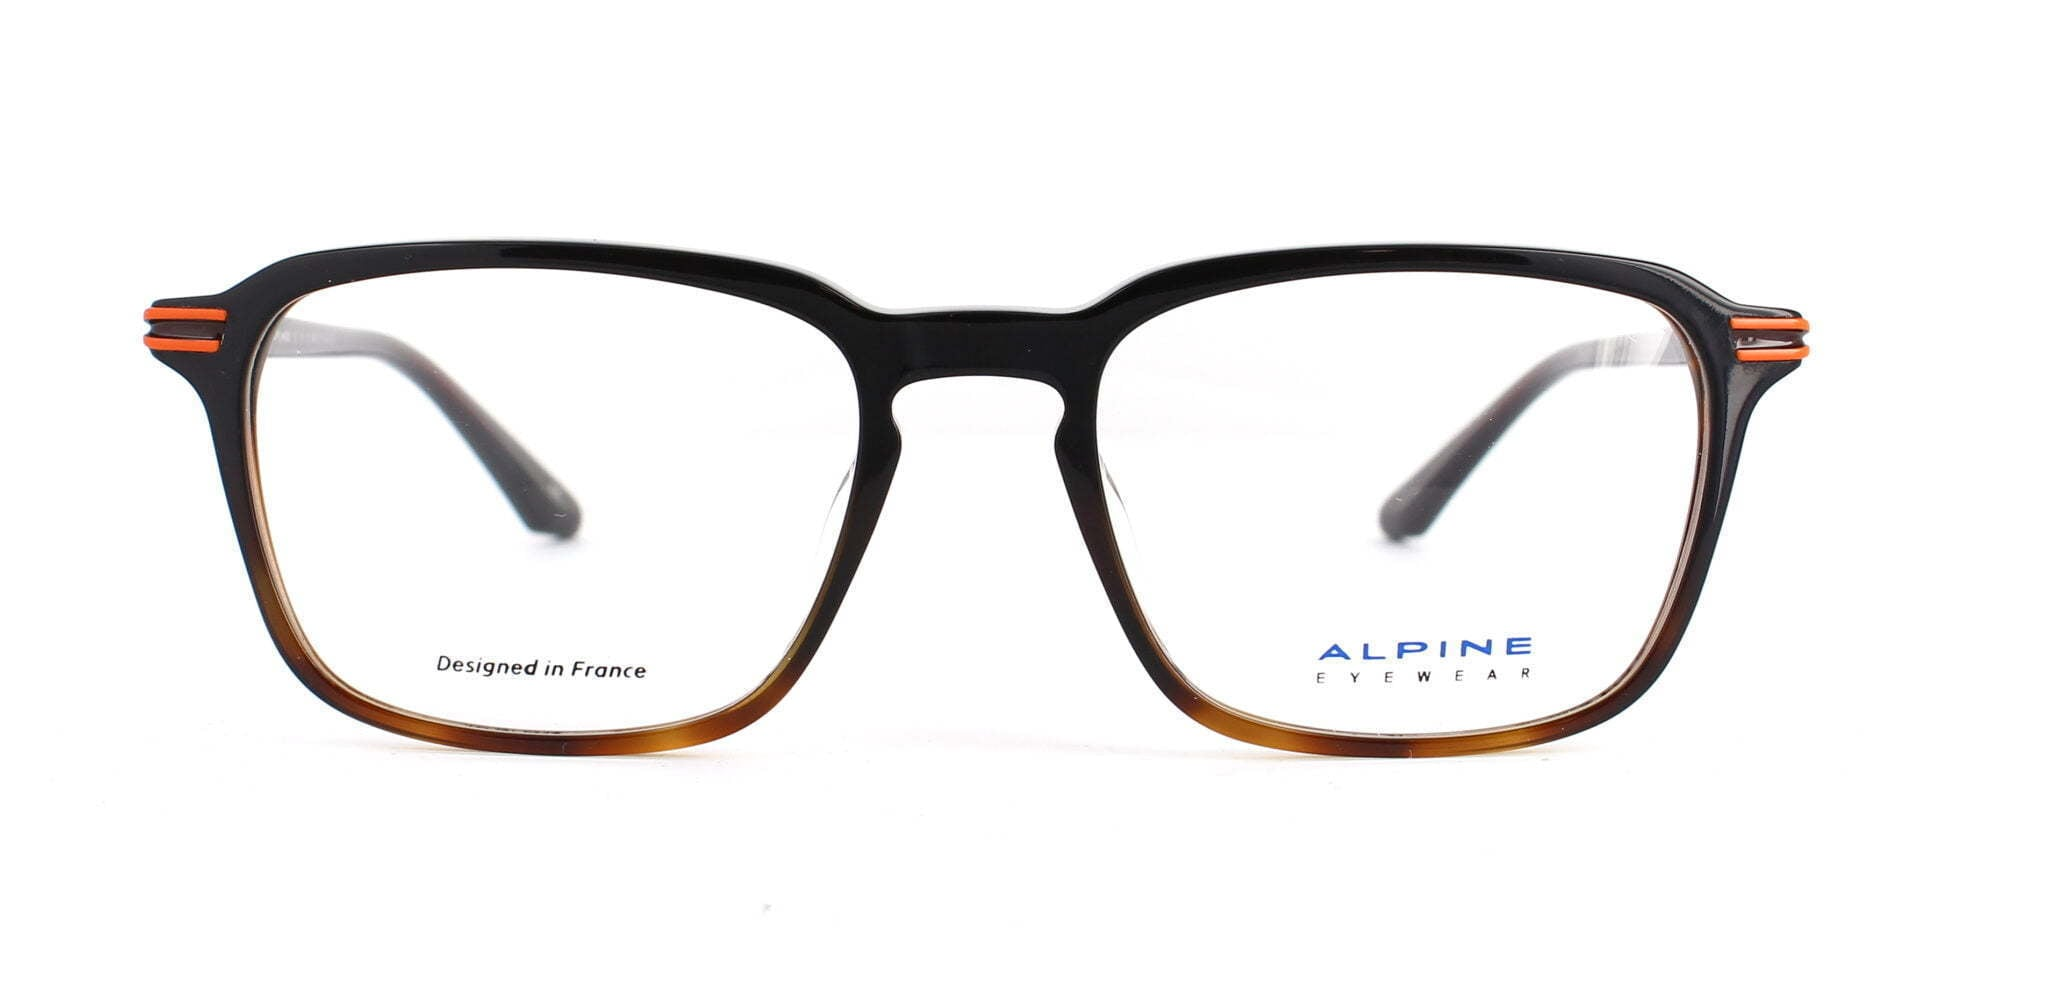 Alpine Eyewear 2020 6 | Alpine Eyewear : la nouvelle collection 2021